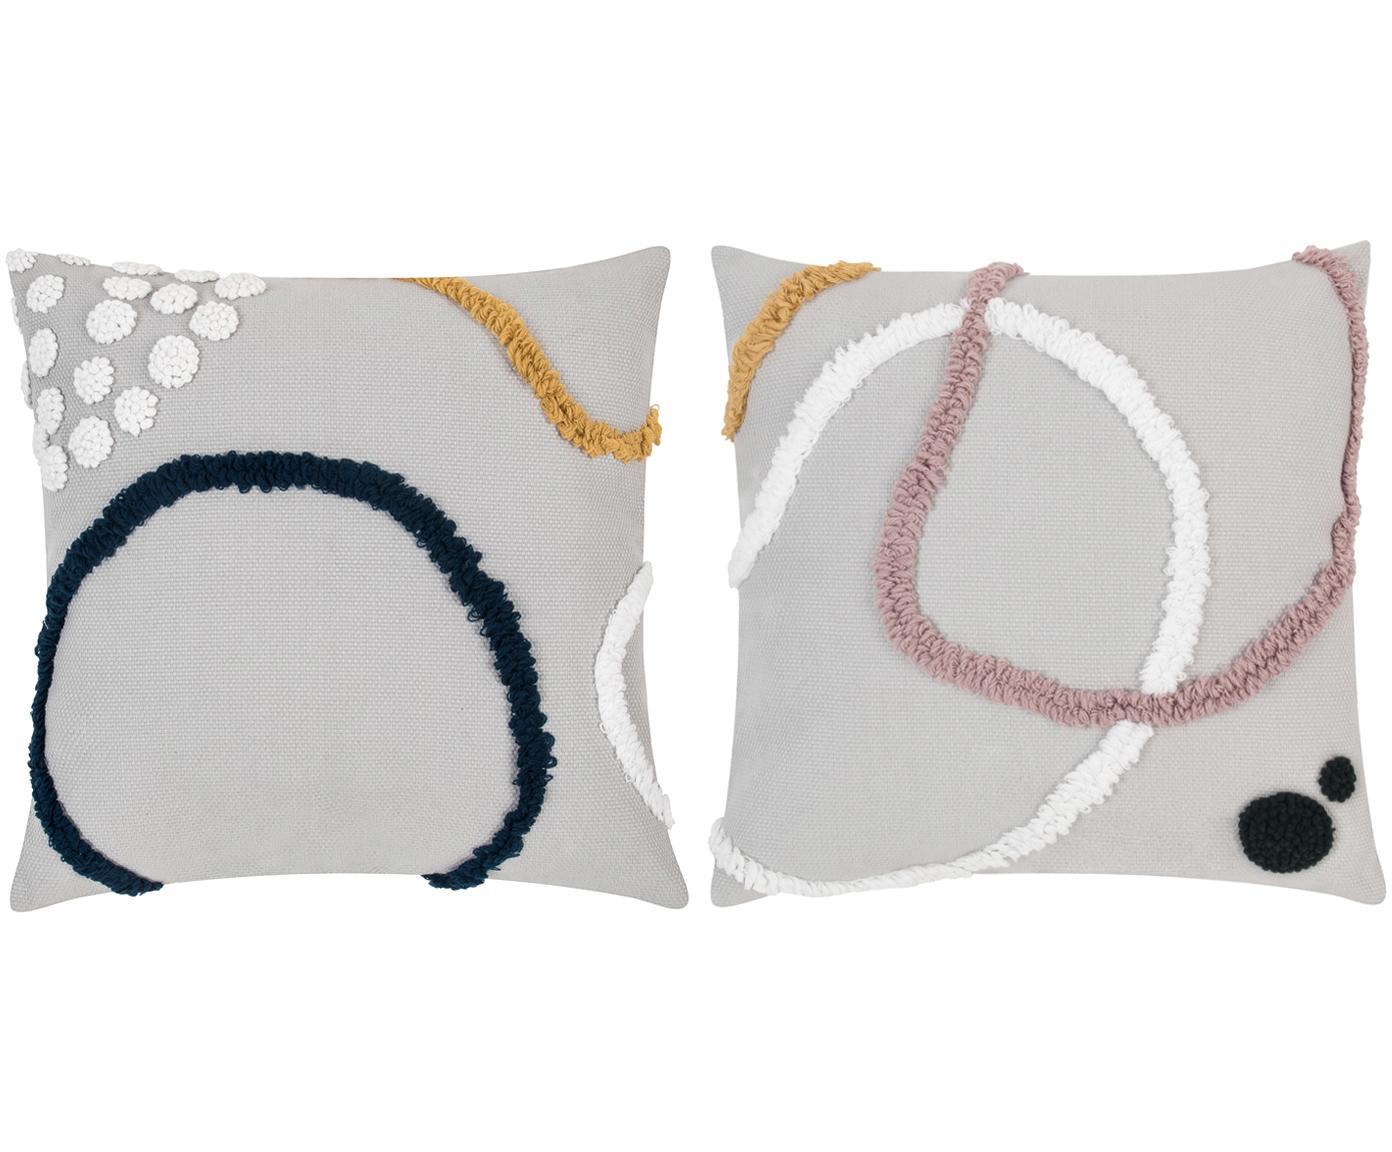 Set de fundas de cojín Pablo, 2uds., Algodón, Multicolor, blanco, An 45 x L 45 cm